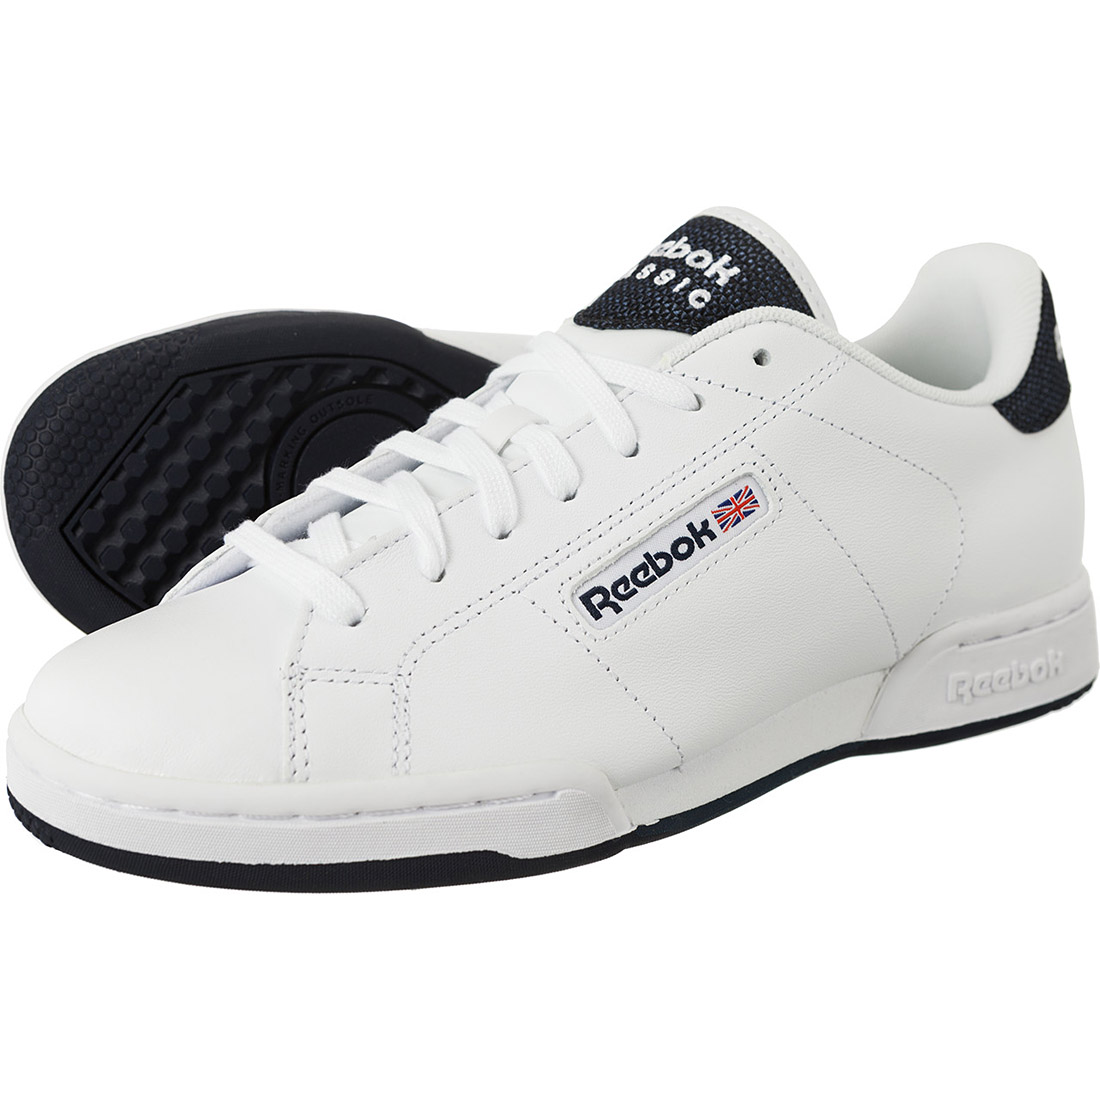 1d496ab299 Reebok Herren Sneaker Classic NPC Rad Pop Schuhe Weiß Leder ...